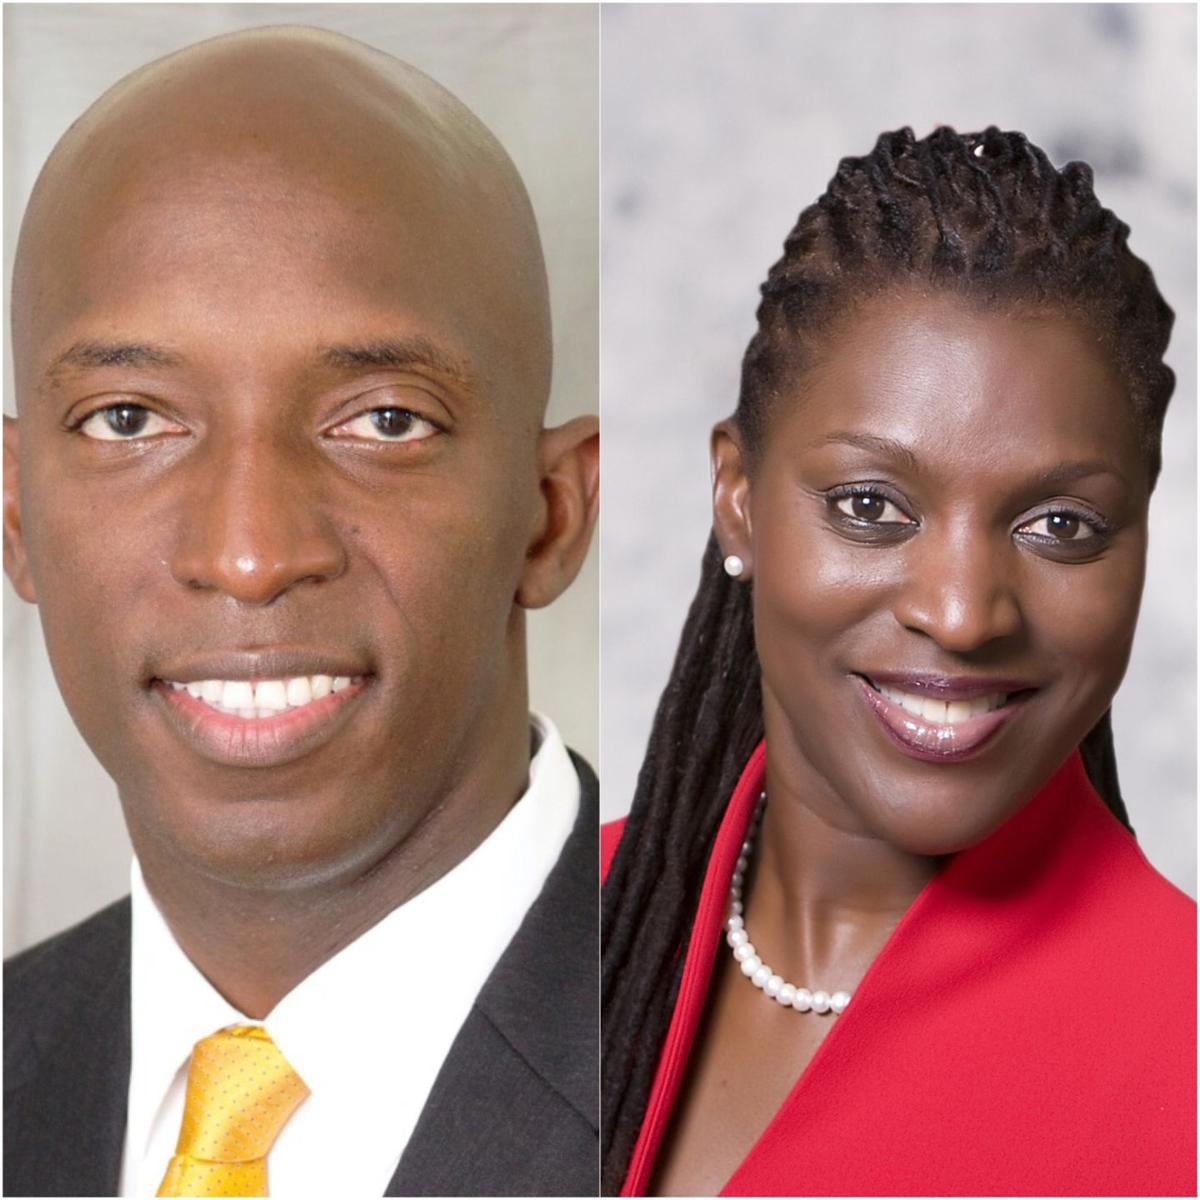 Mayor Wayne Messam and Commissioner Alexandra Davis